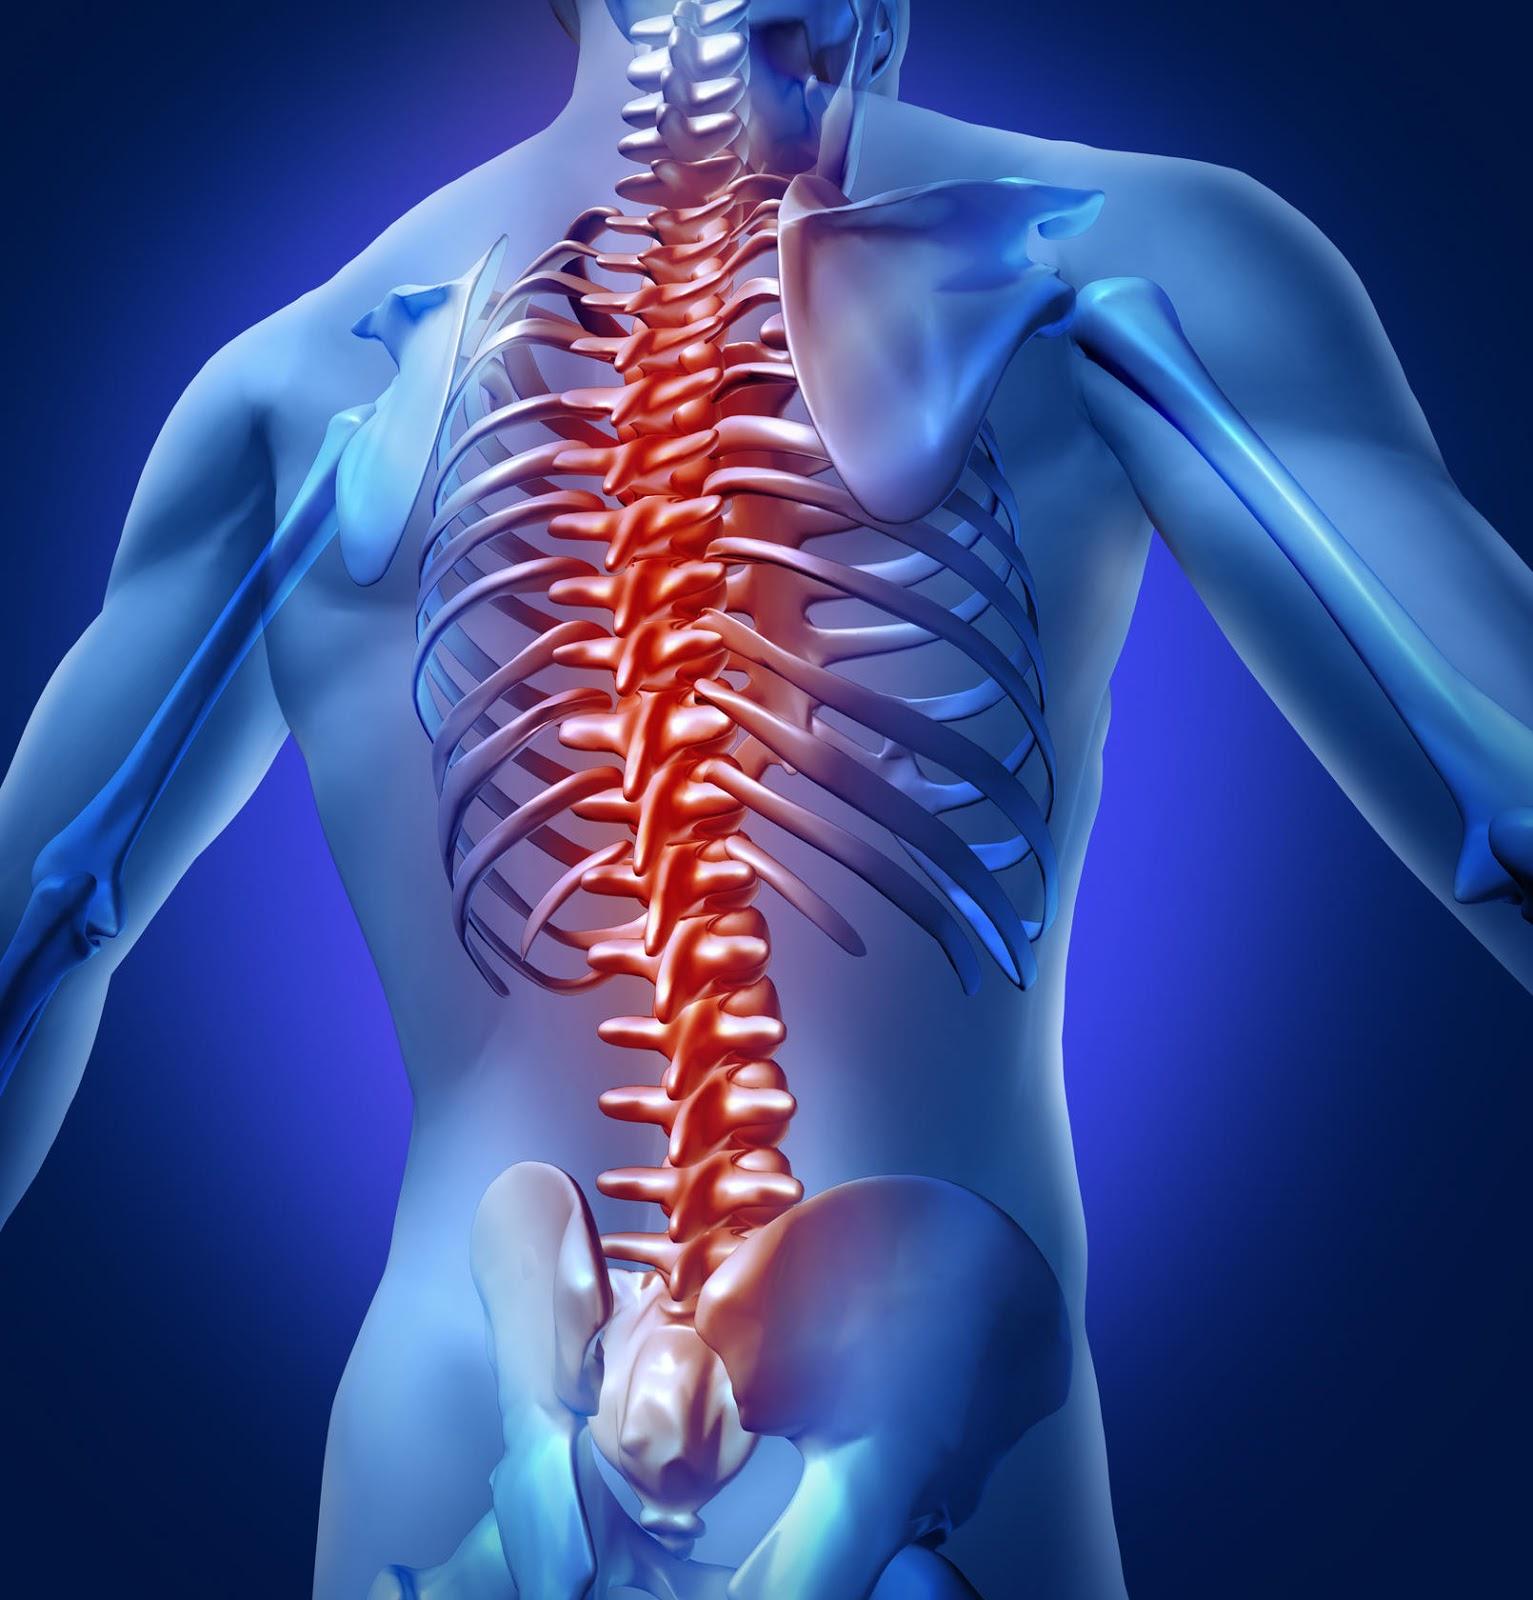 Hasil gambar untuk cedera saraf tulang belakang